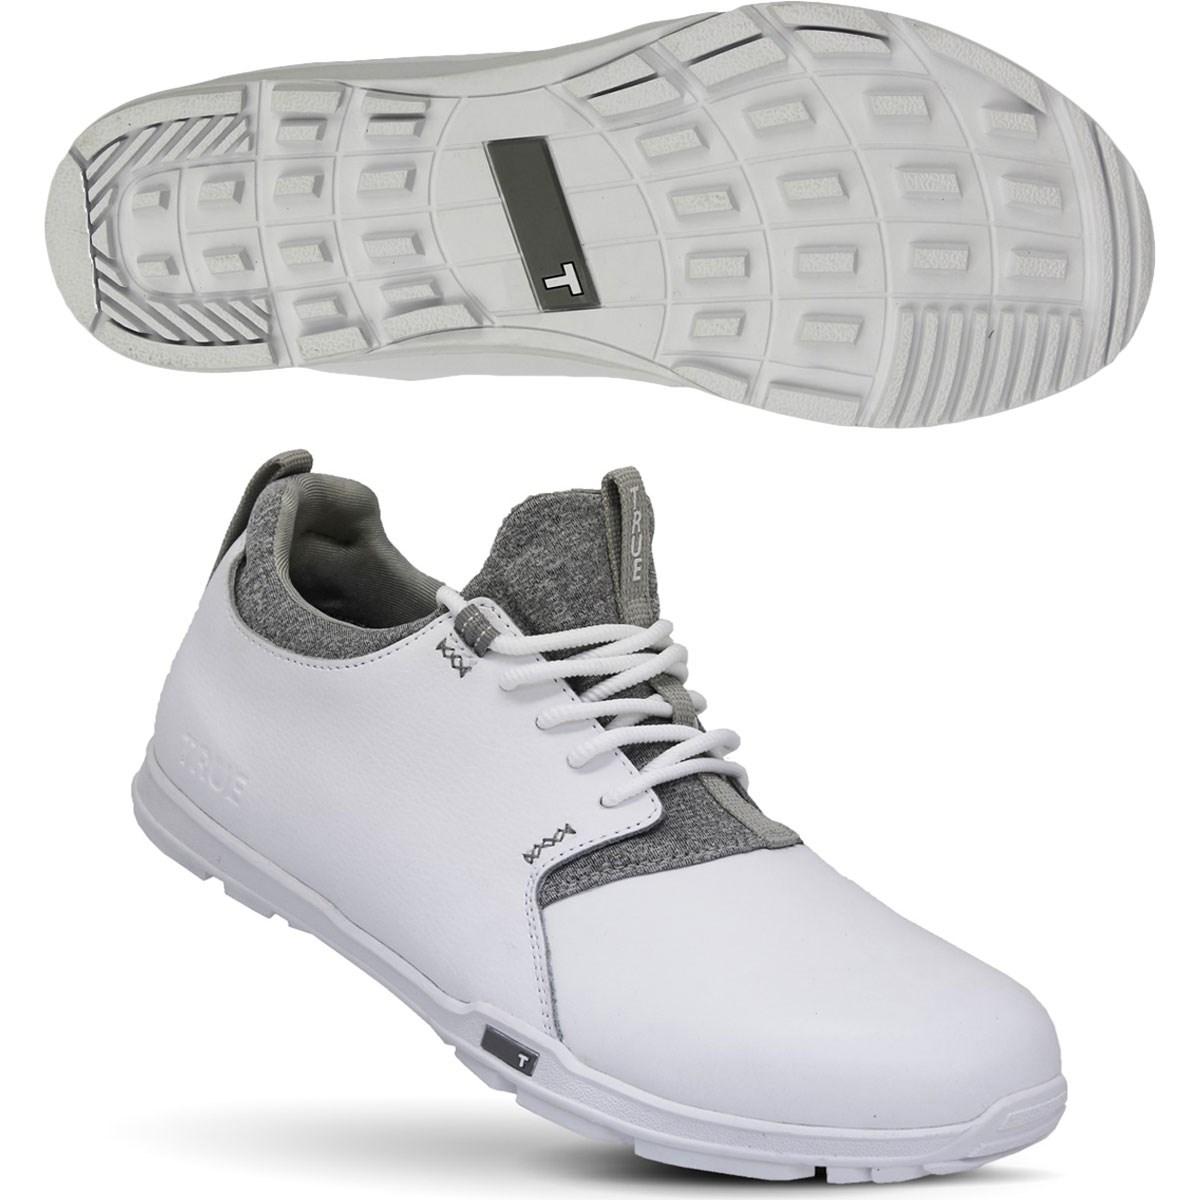 TRUE linkswear トゥルーリンクスウェア ORIGINAL シューズ 26.5cm ホワイト 00